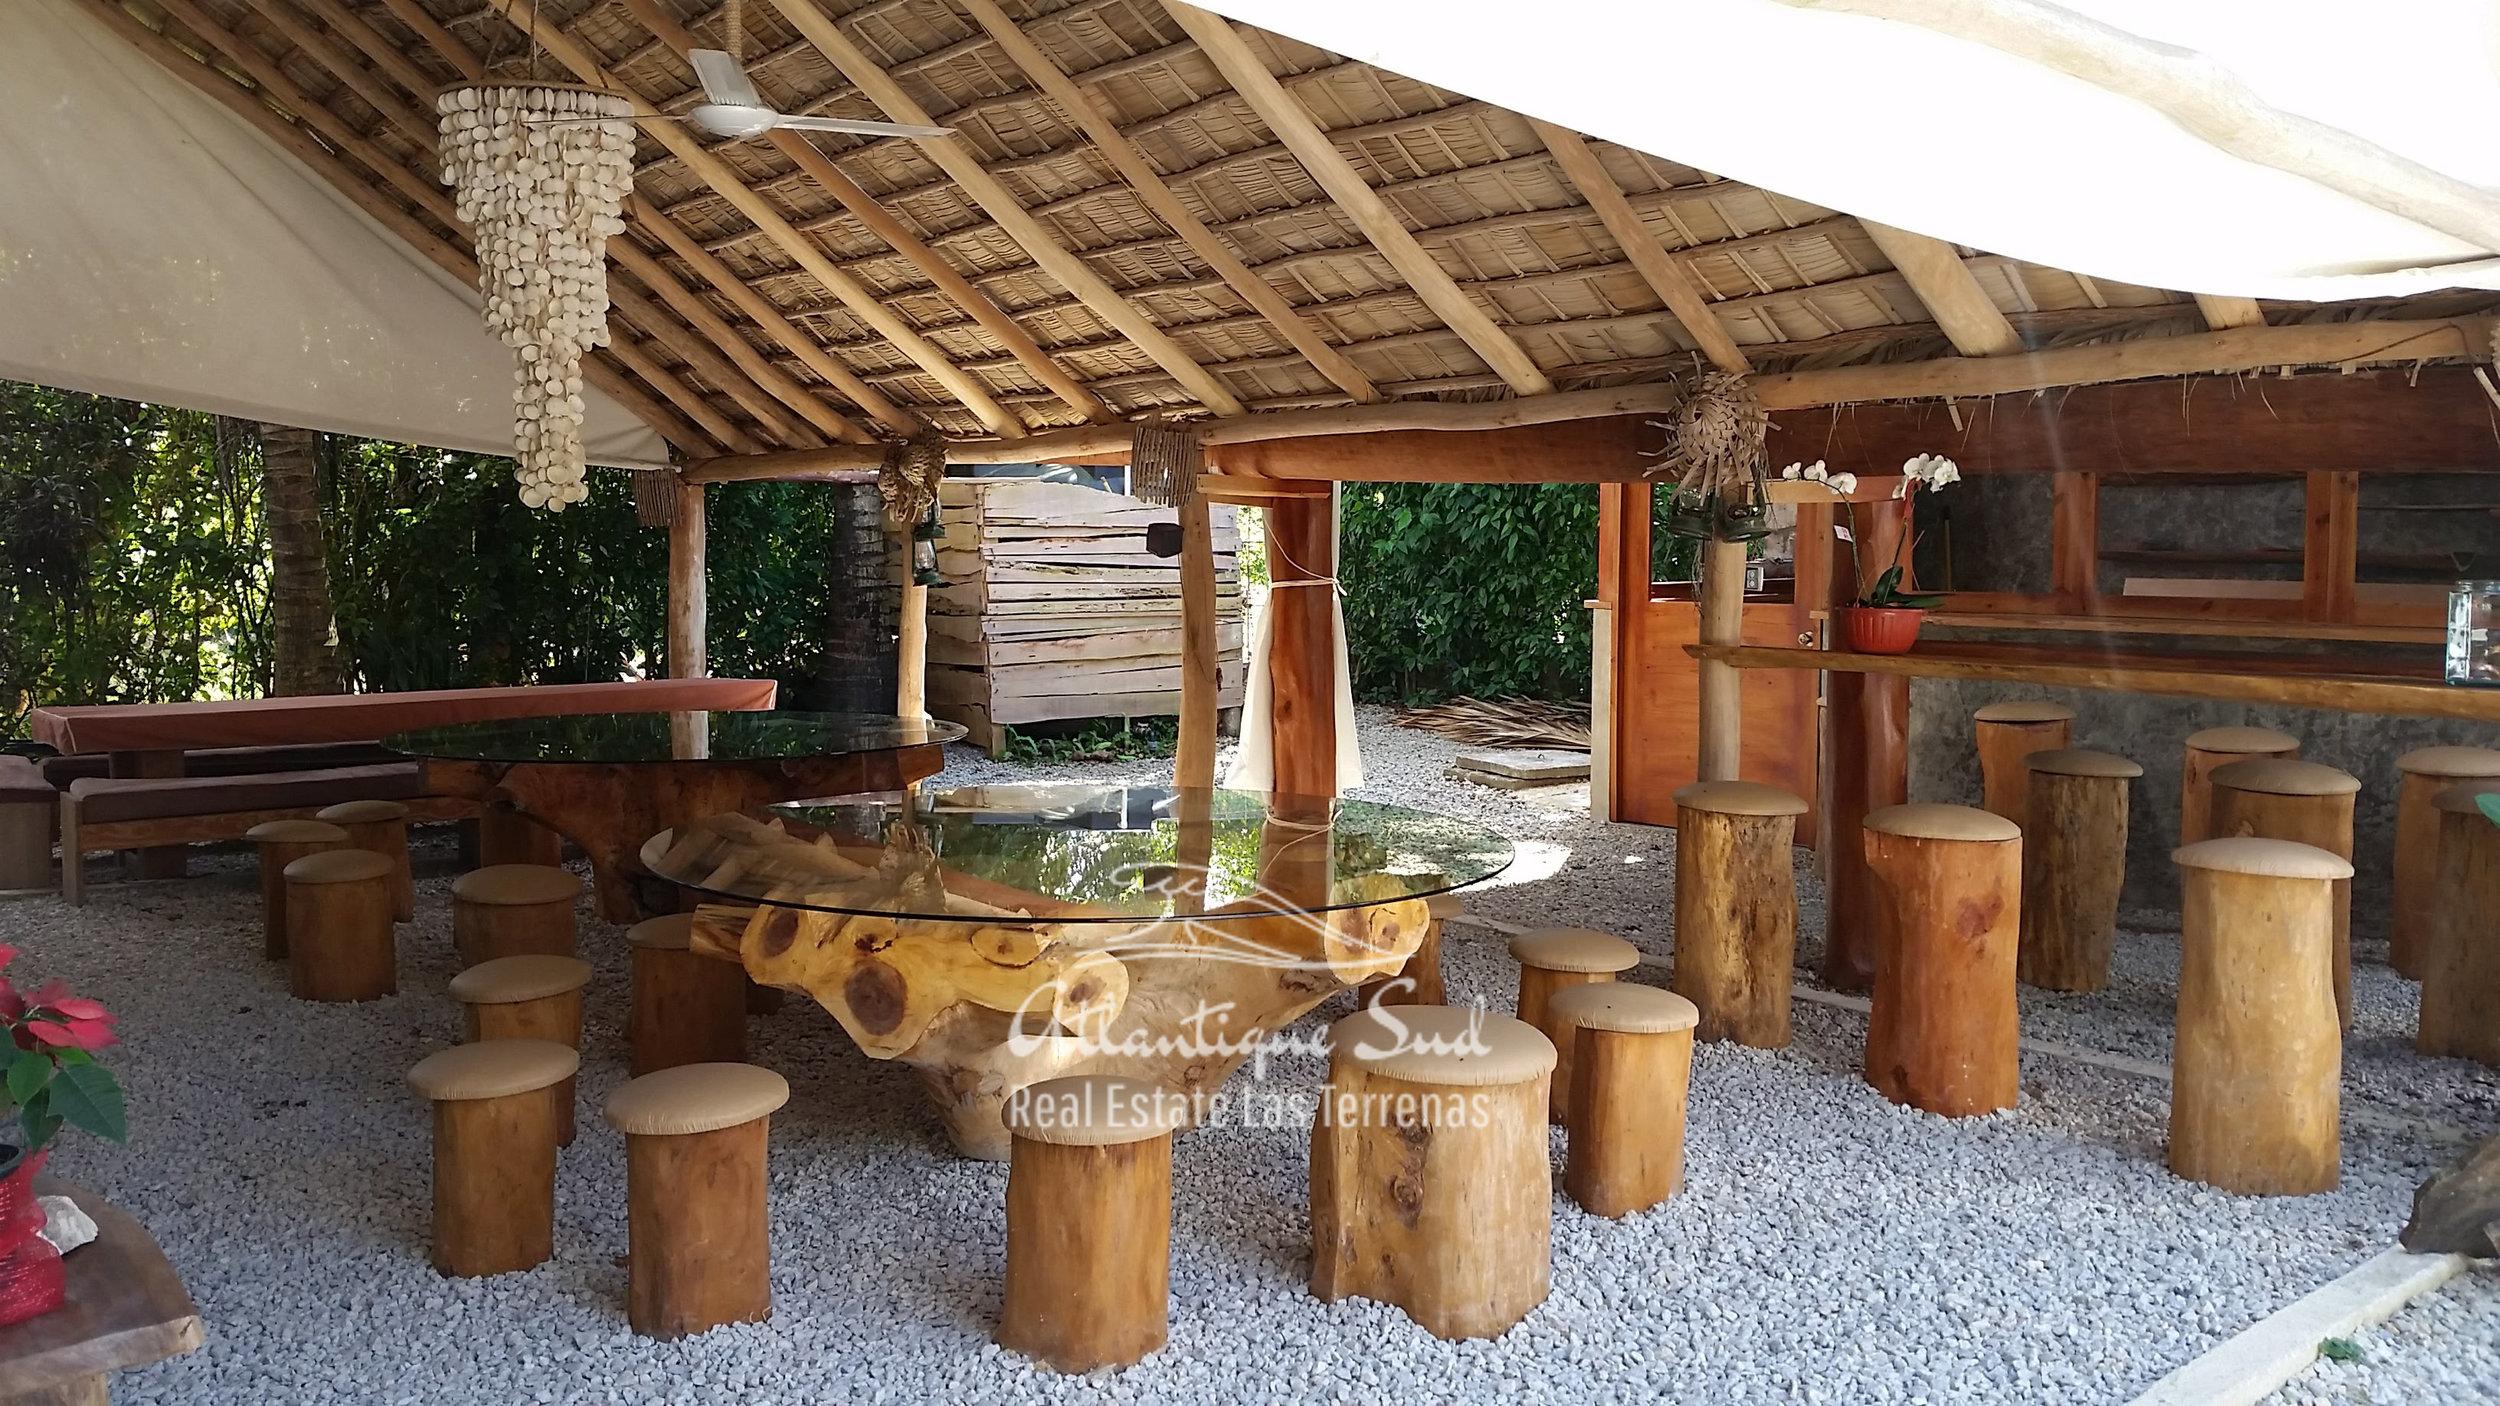 Typical caribbean hotel for sale Real Estate Las Terrenas Dominican Republic Atlantique Sud28.jpg